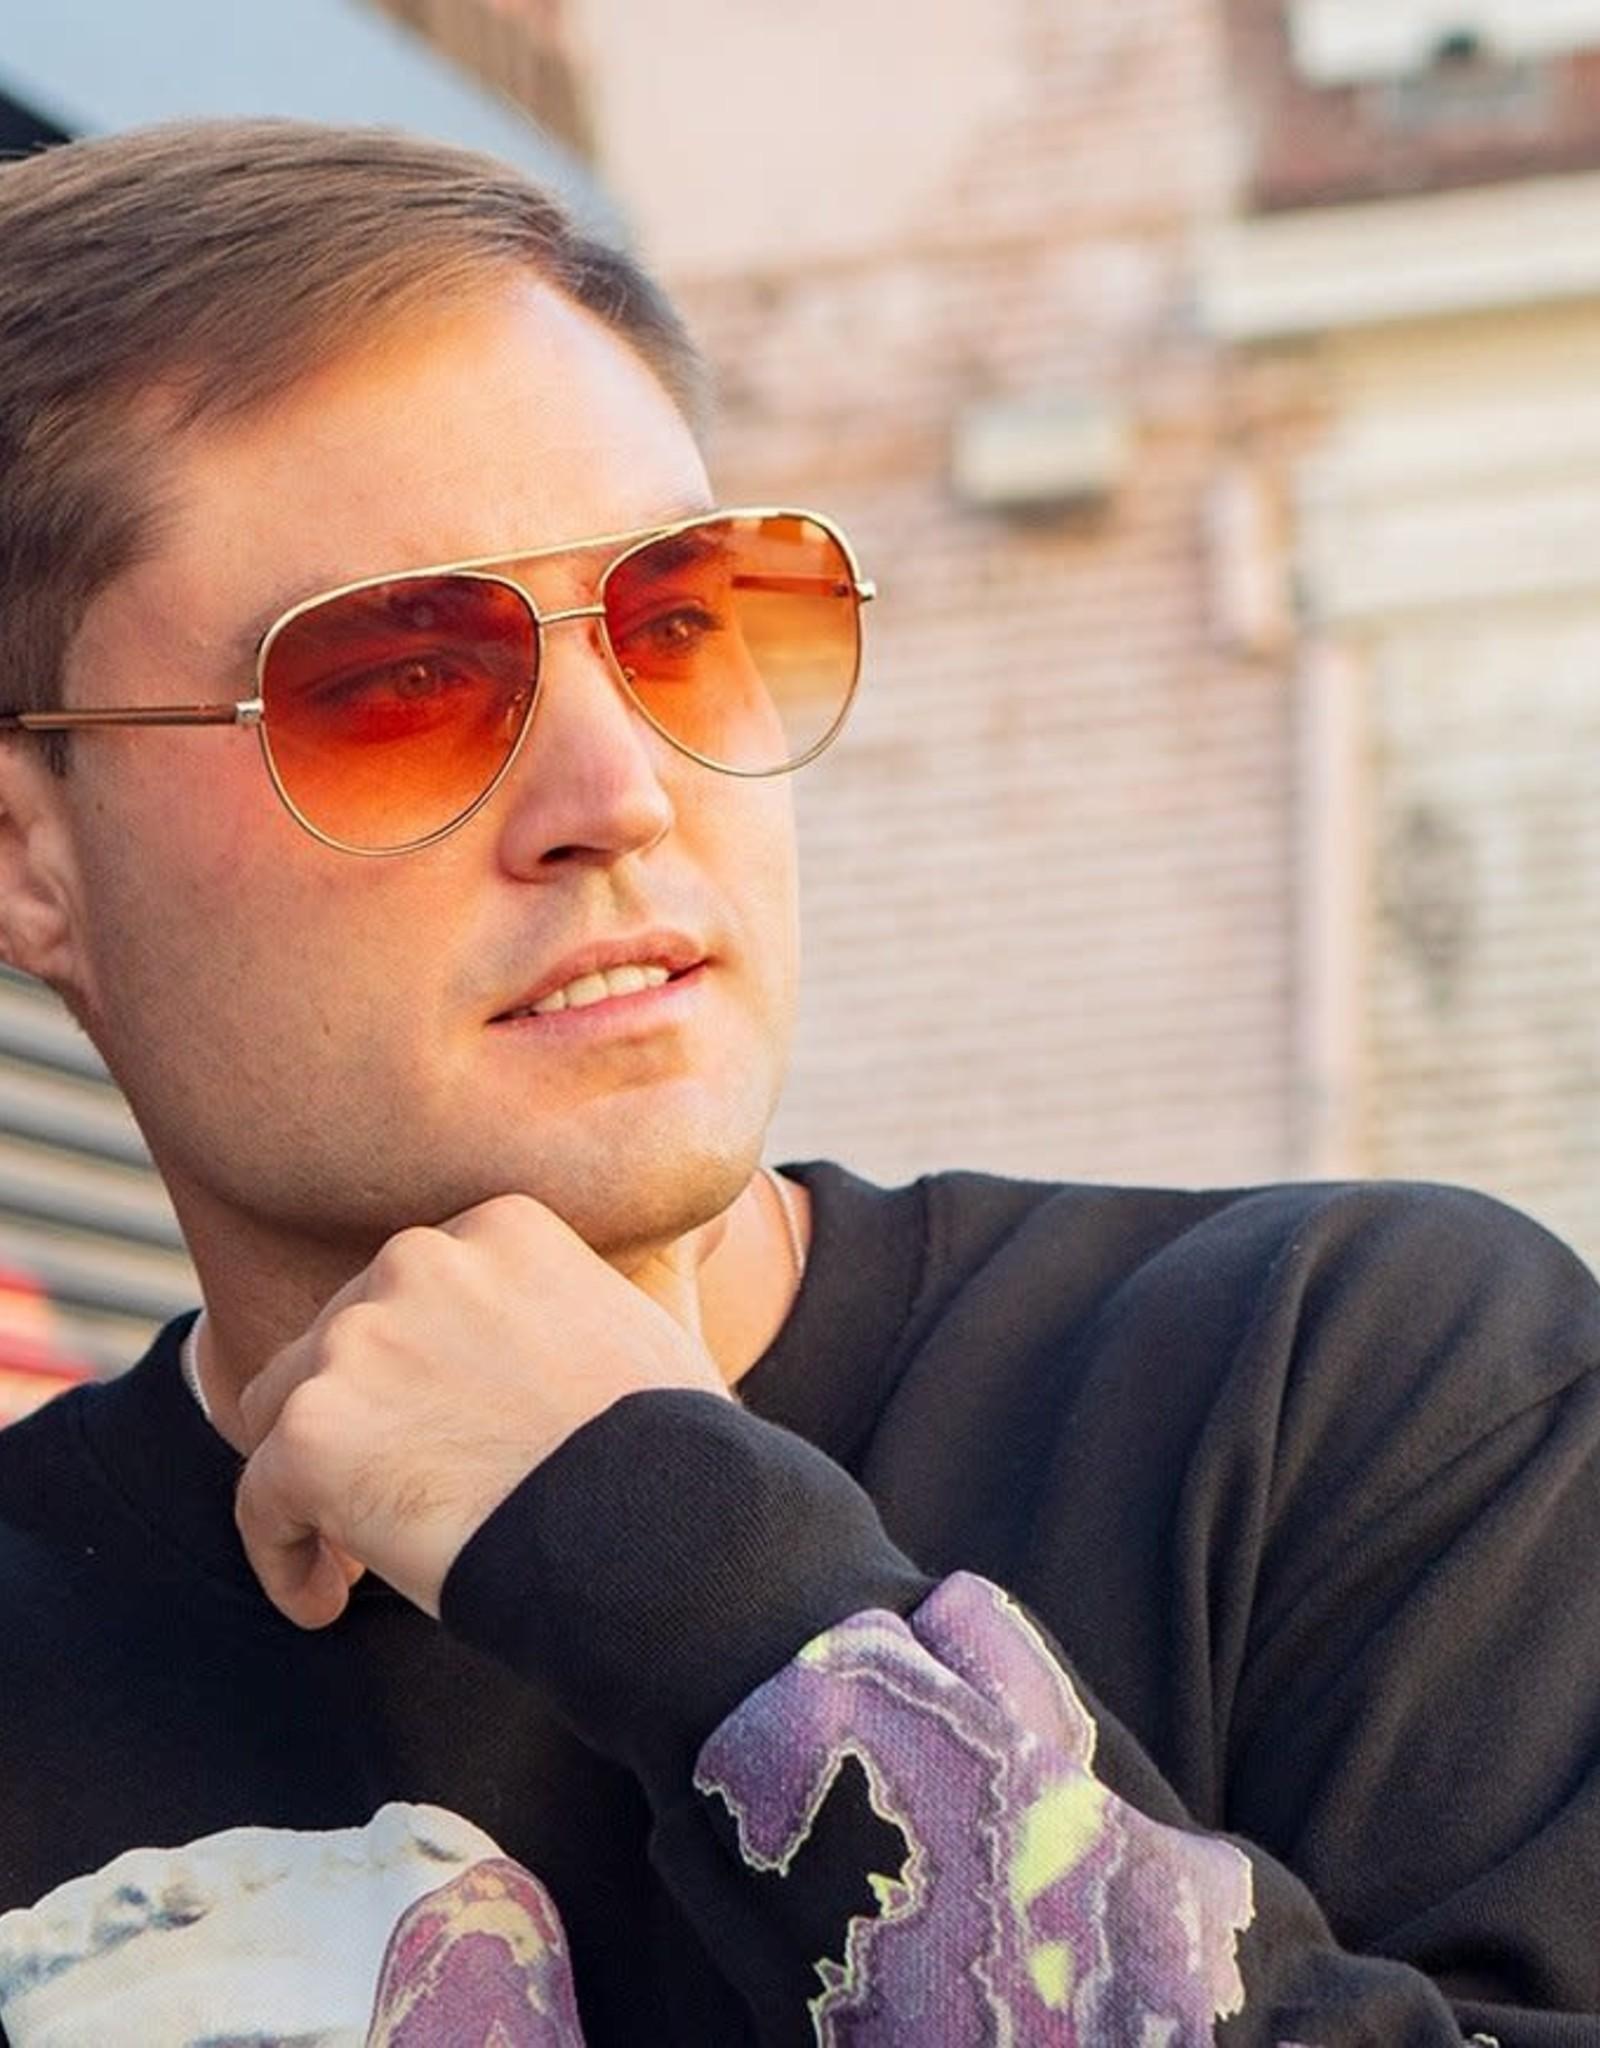 AJ Morgan Hank Rambler Sunglasses, AJ Morgan